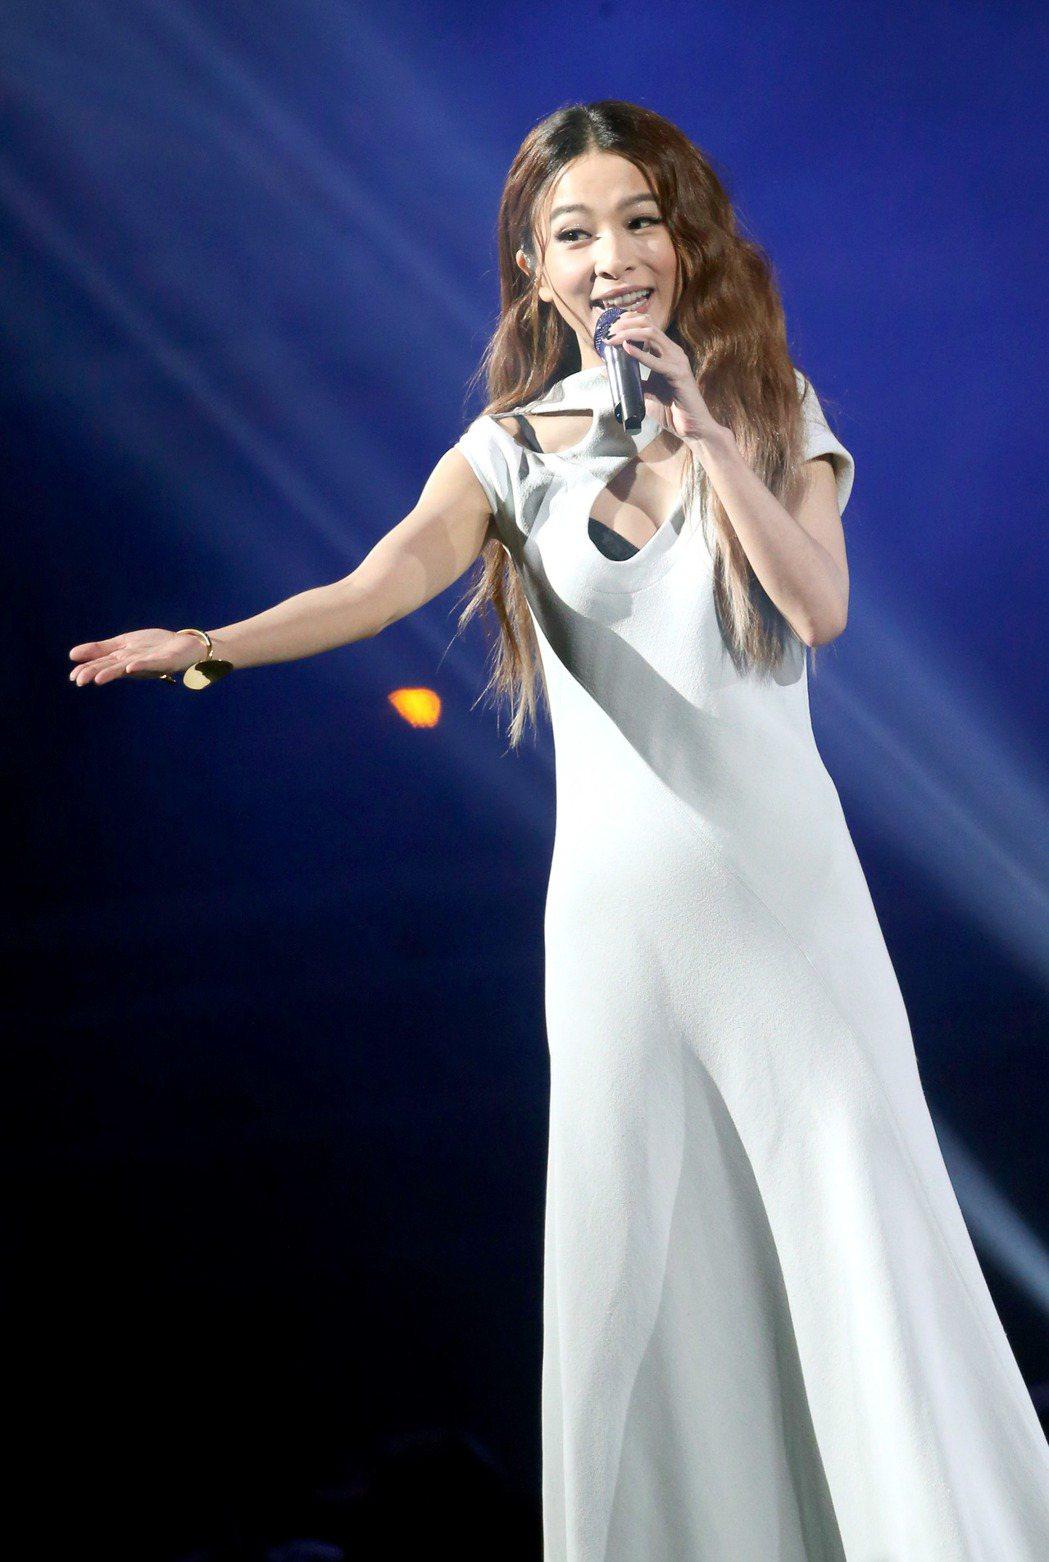 KKBOX風雲榜昨天在台北小巨蛋舉行,田馥甄小露性感演唱。記者屠惠剛/攝影